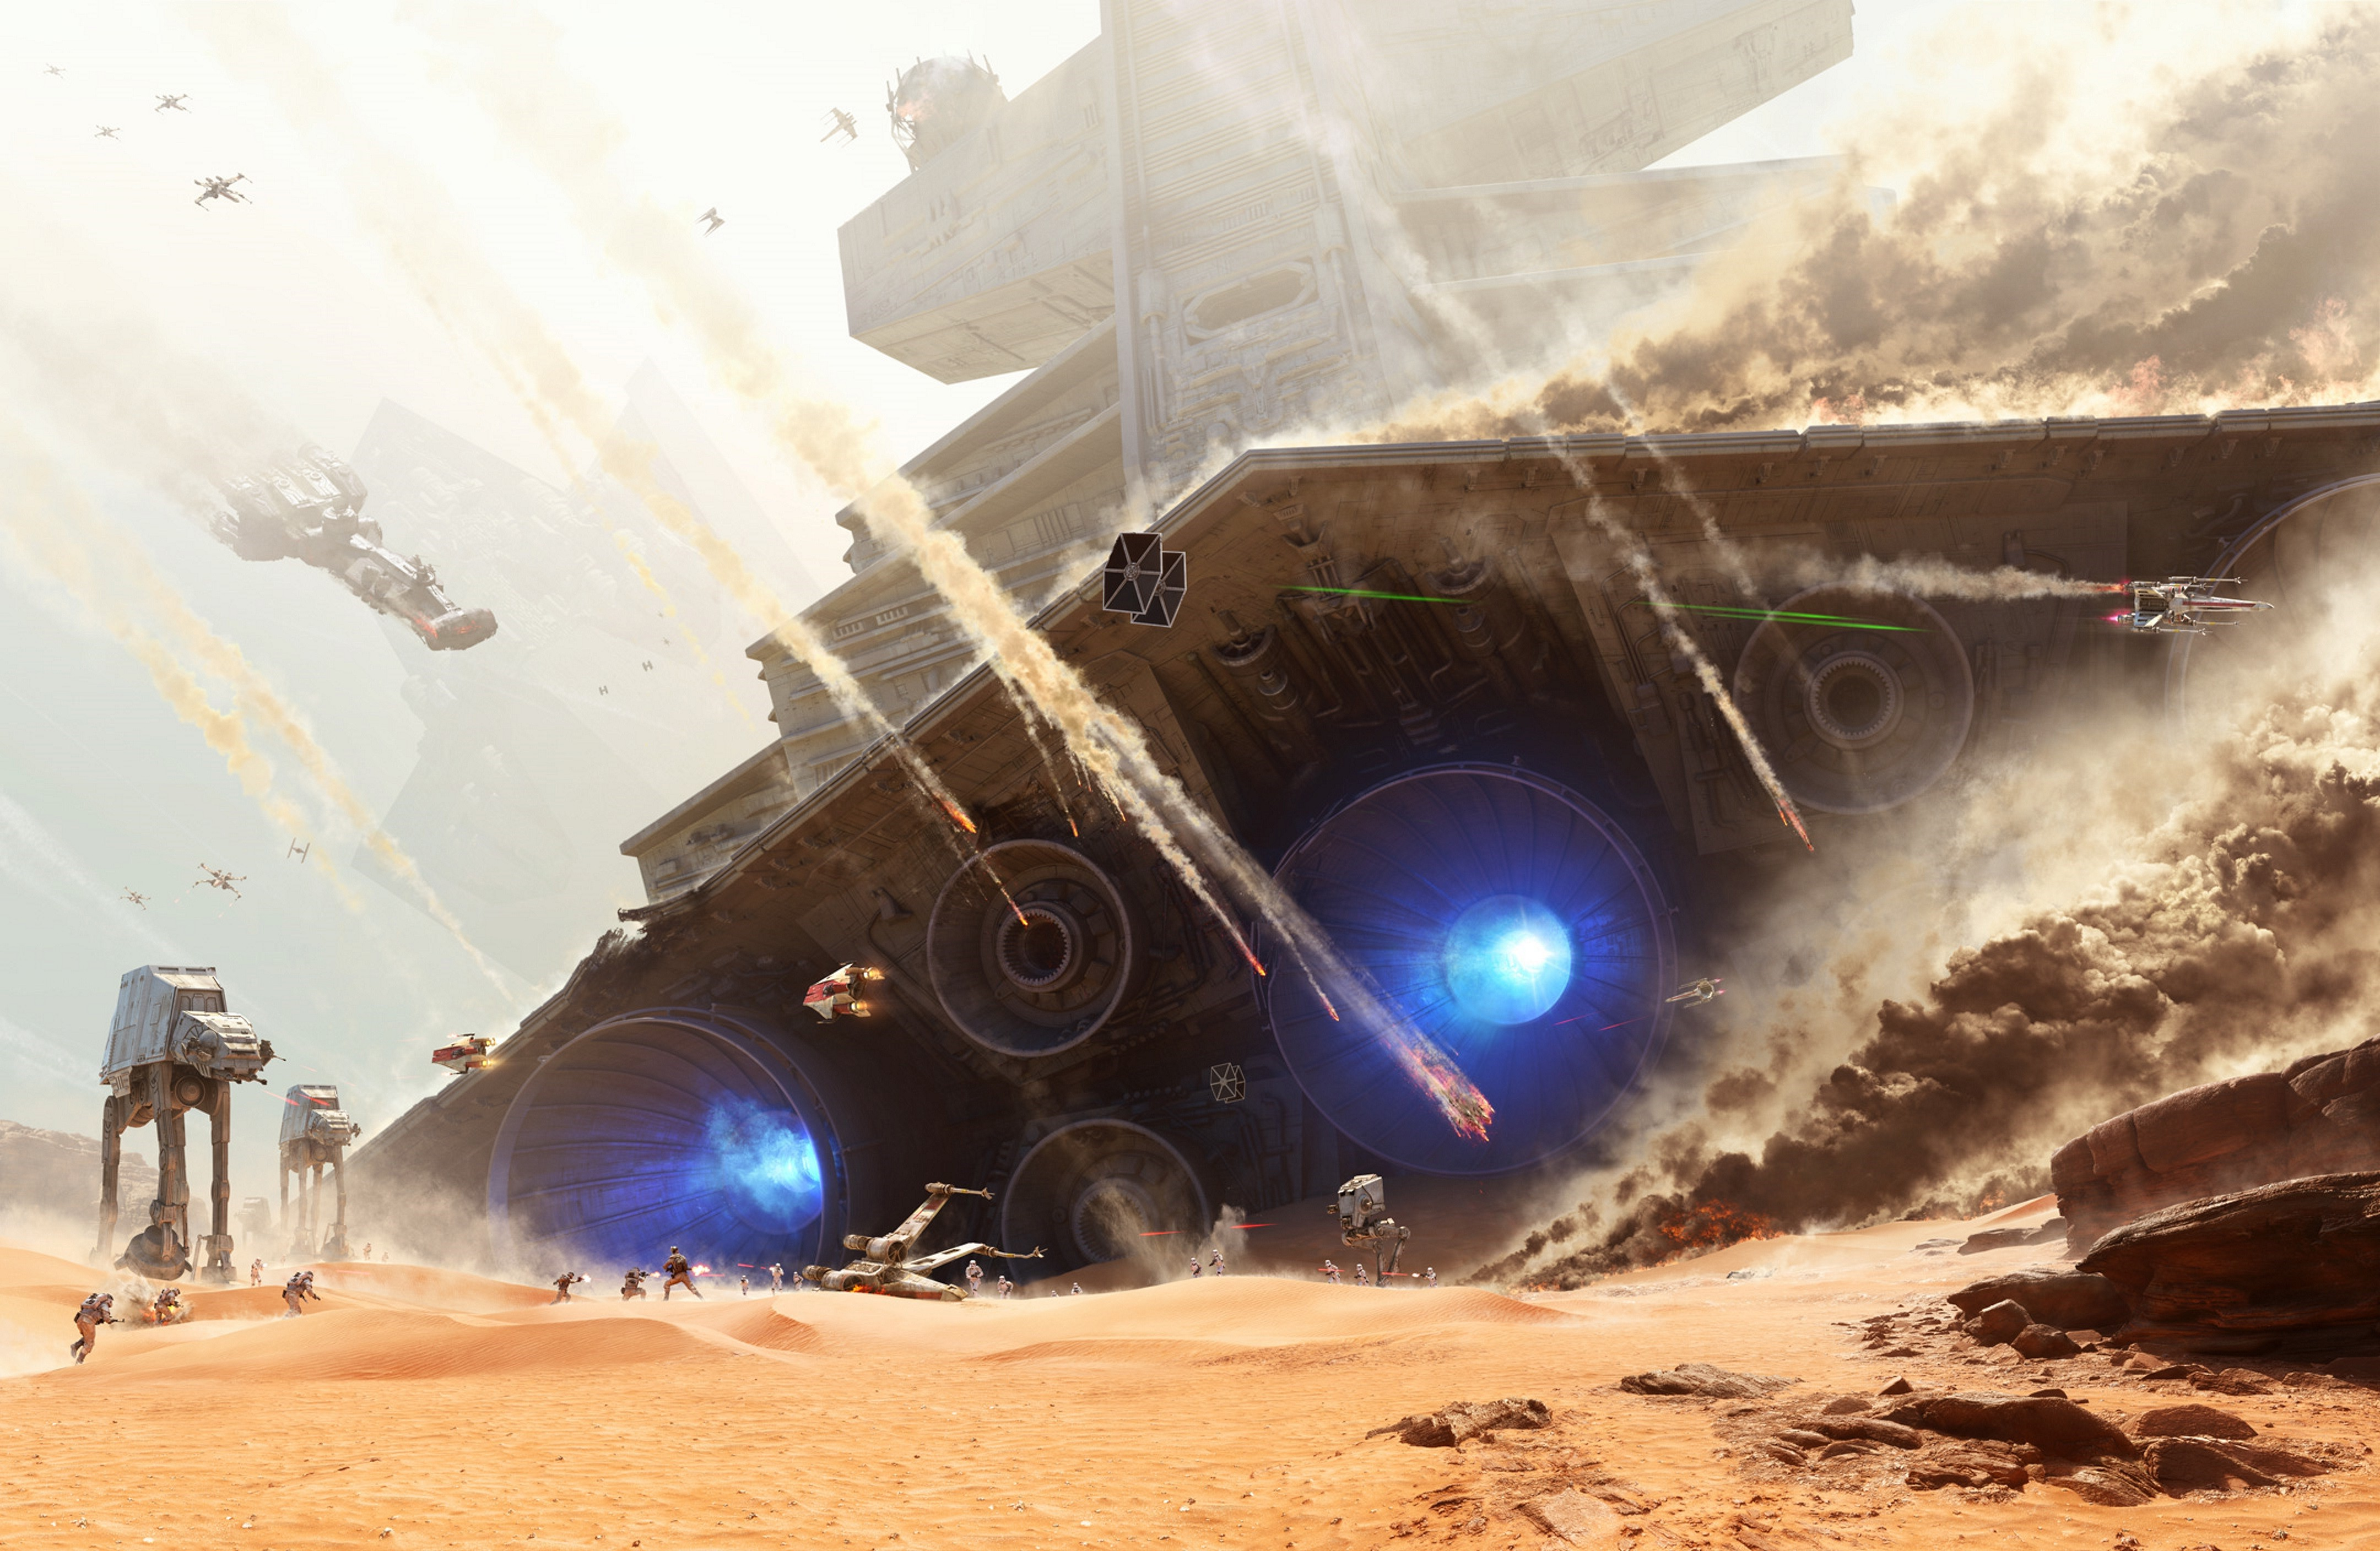 Star Wars, Star Wars: Battlefront Wallpapers HD / Desktop and